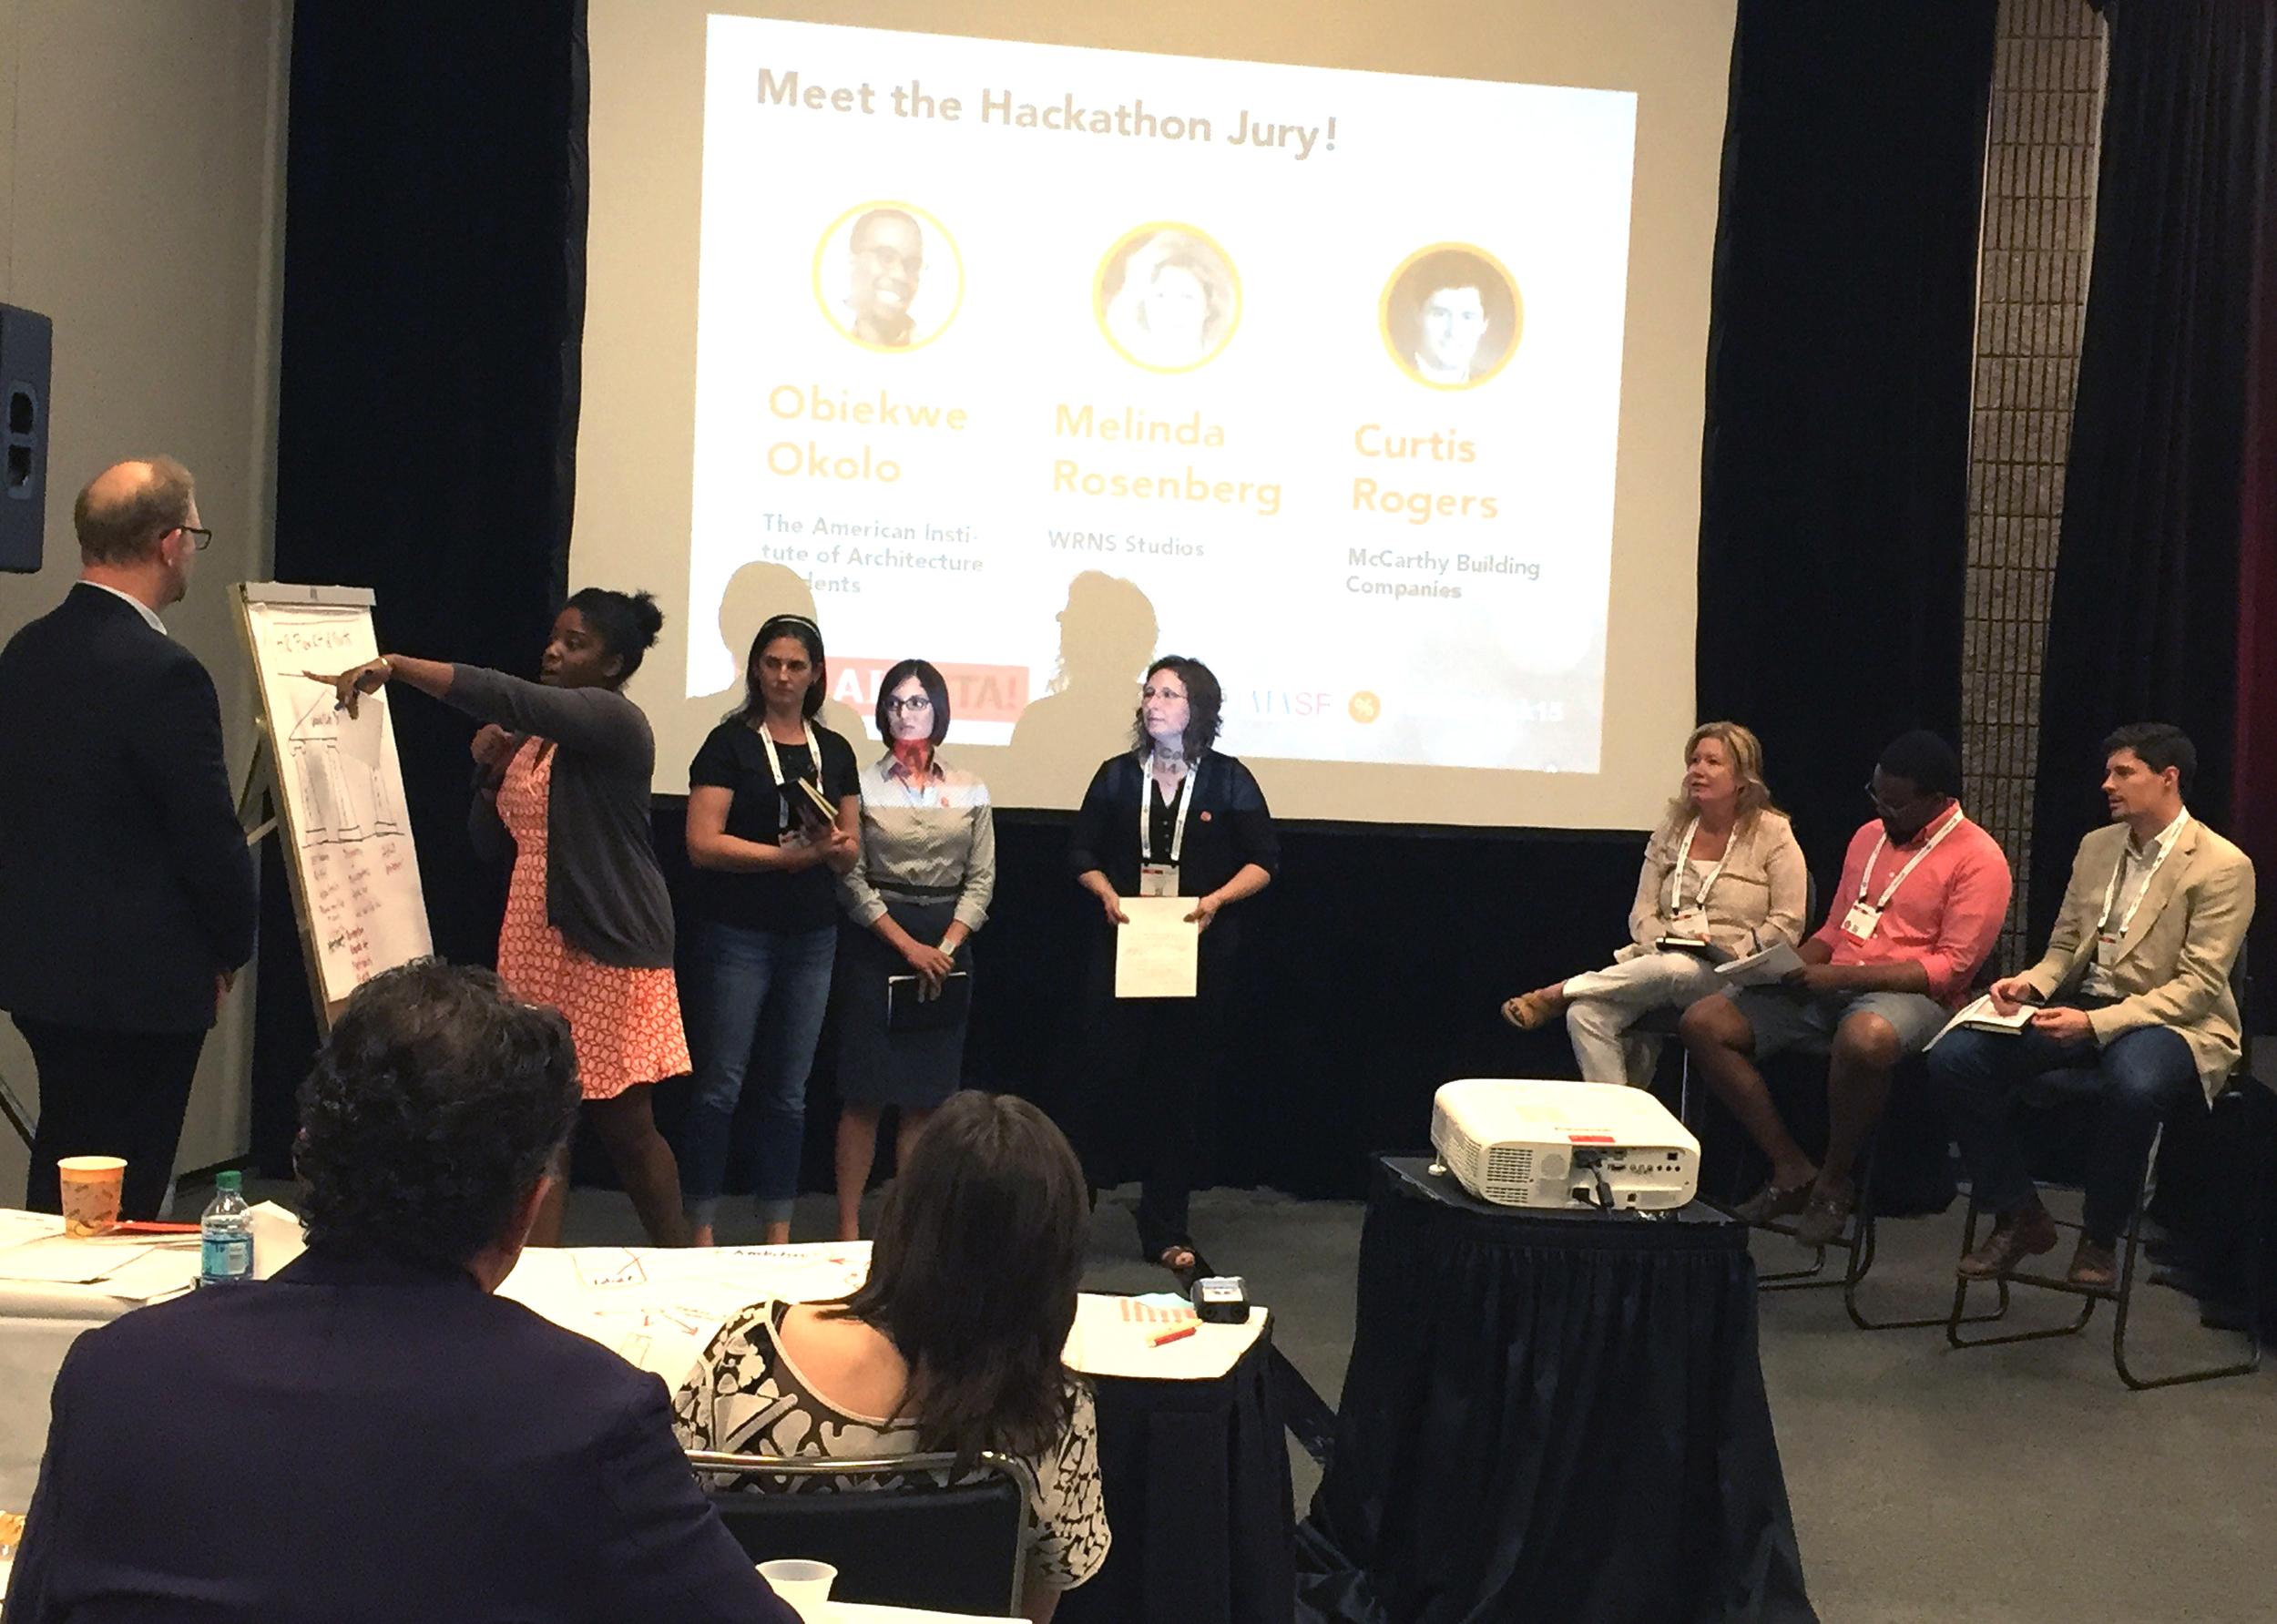 Phil Bernstein, Melissa Daniel, Ashley L. Dunn, Morgan Maiolie andShawna Hammon present to the EQxD Hackathon judges